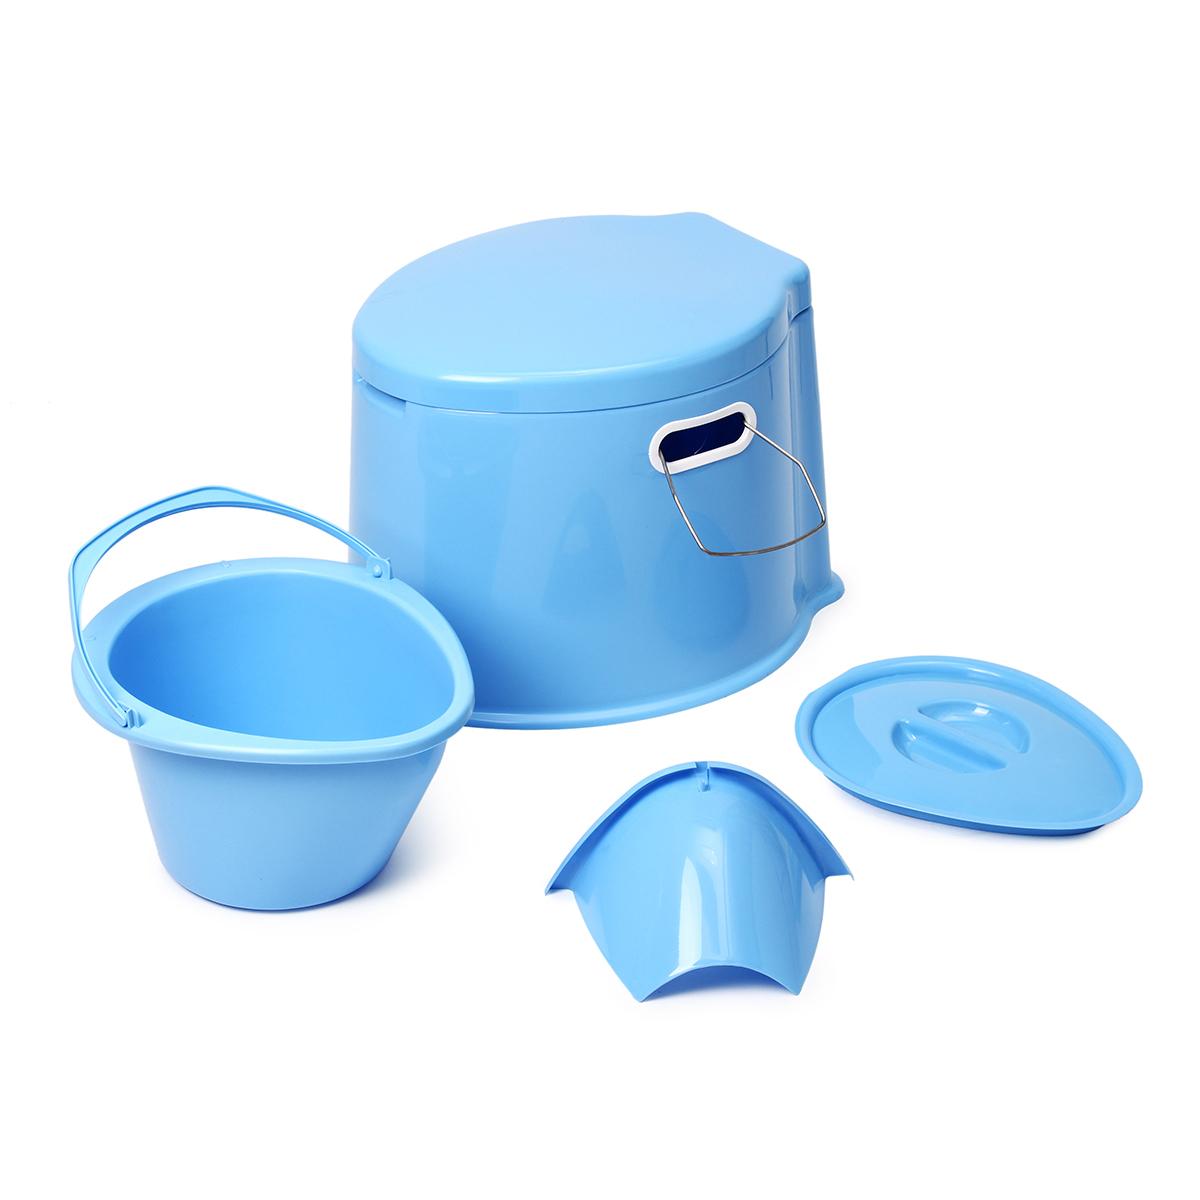 Wc reise eimer toilette campingtoilette f r mobilehome toiletteneimer camping wc ebay - Camping toilette fur gartenhaus ...